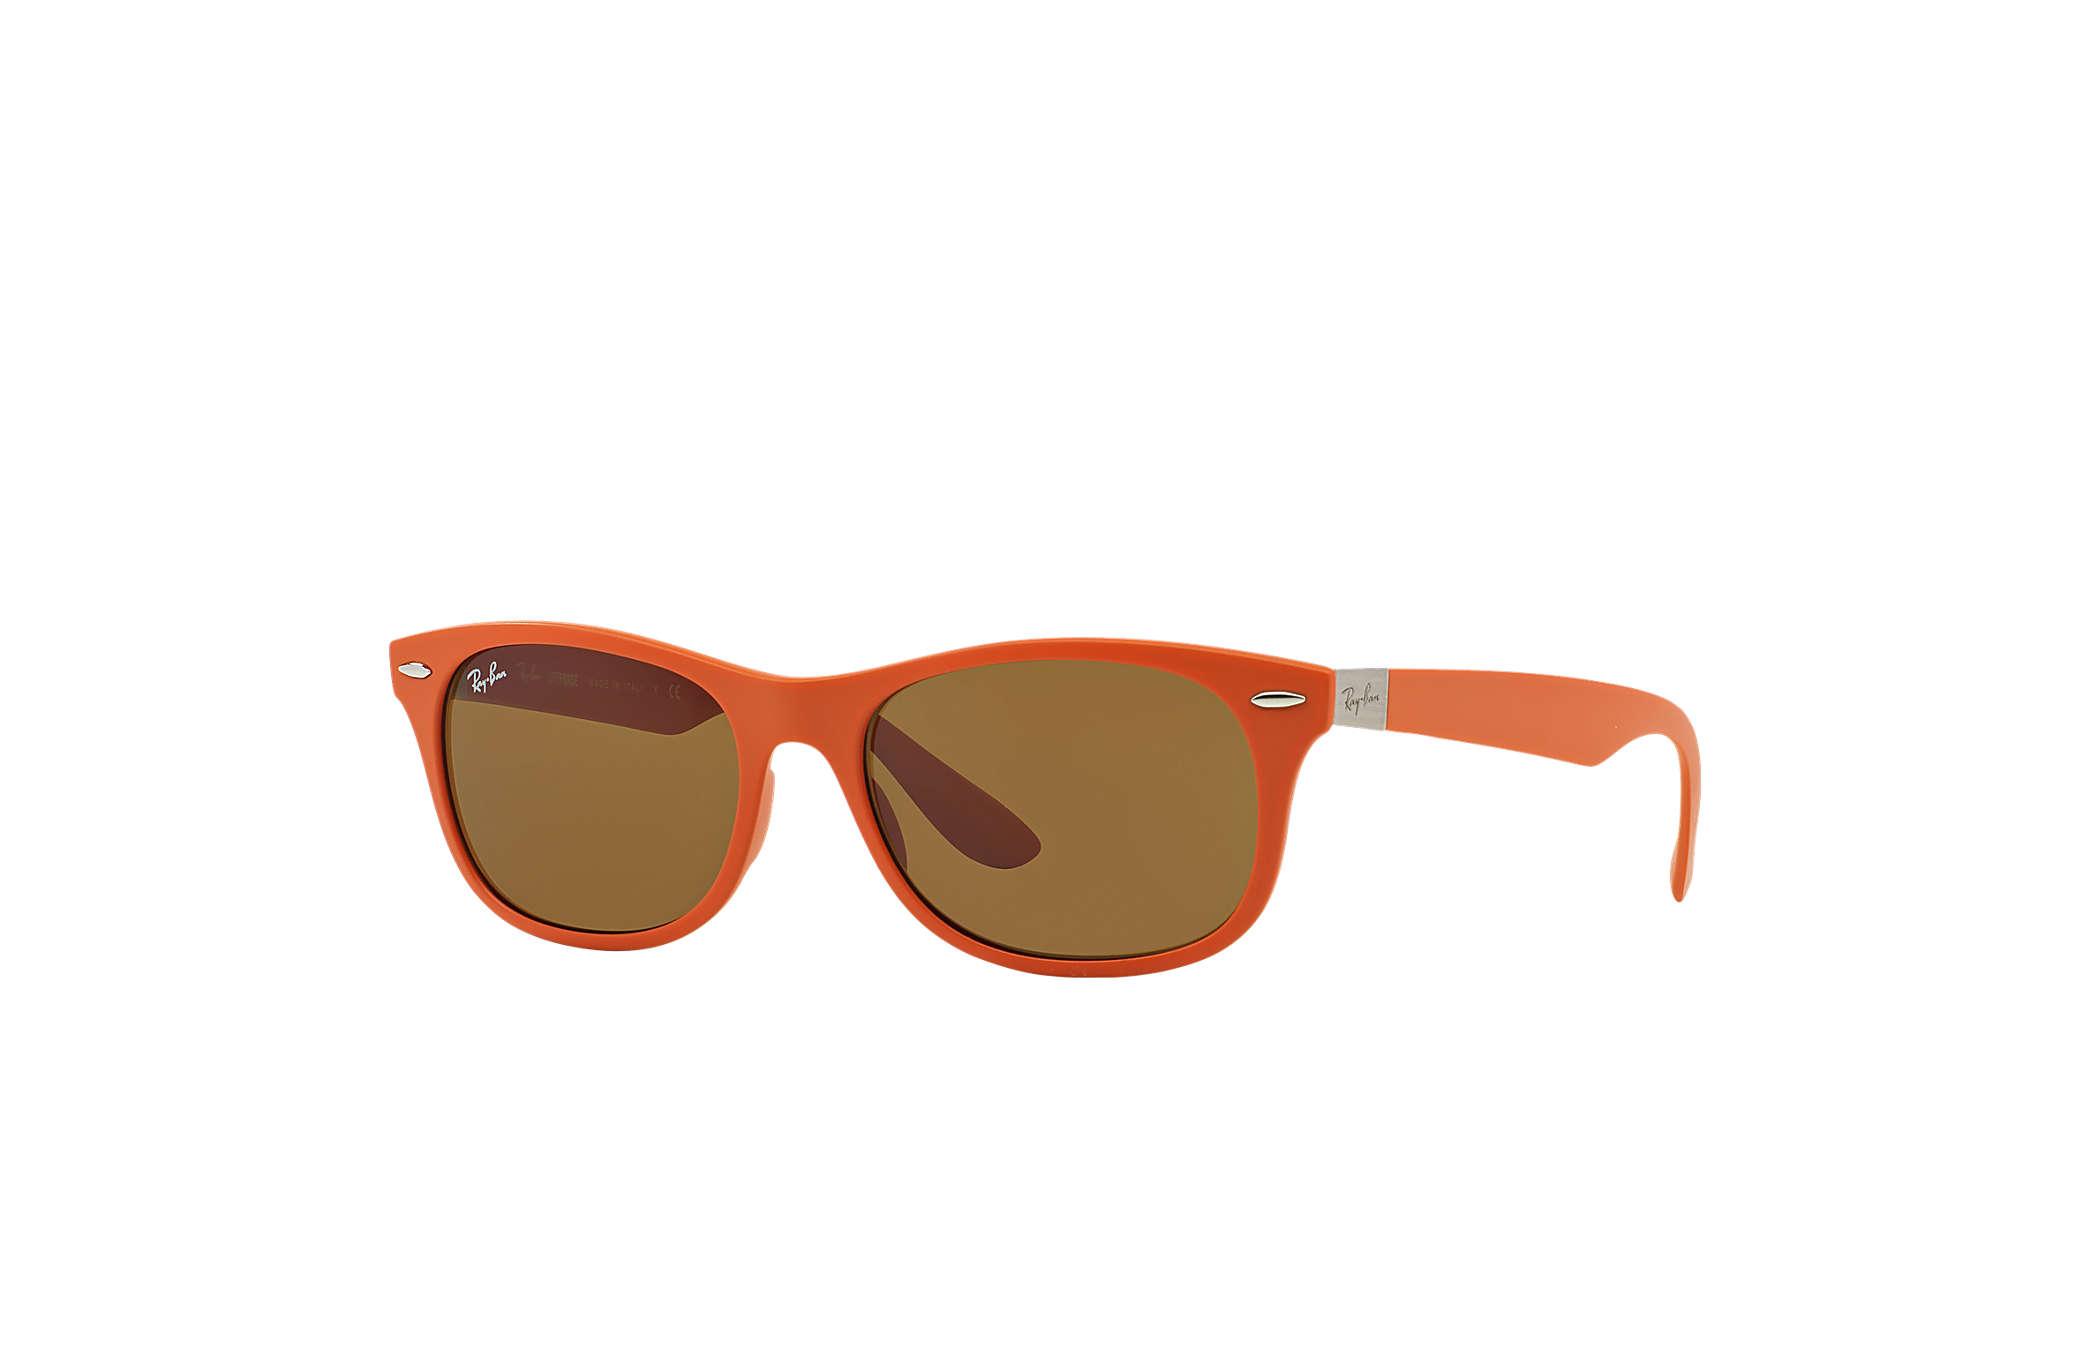 68fcf1542f0 Ray Ban Wayfarer White Orange « Heritage Malta